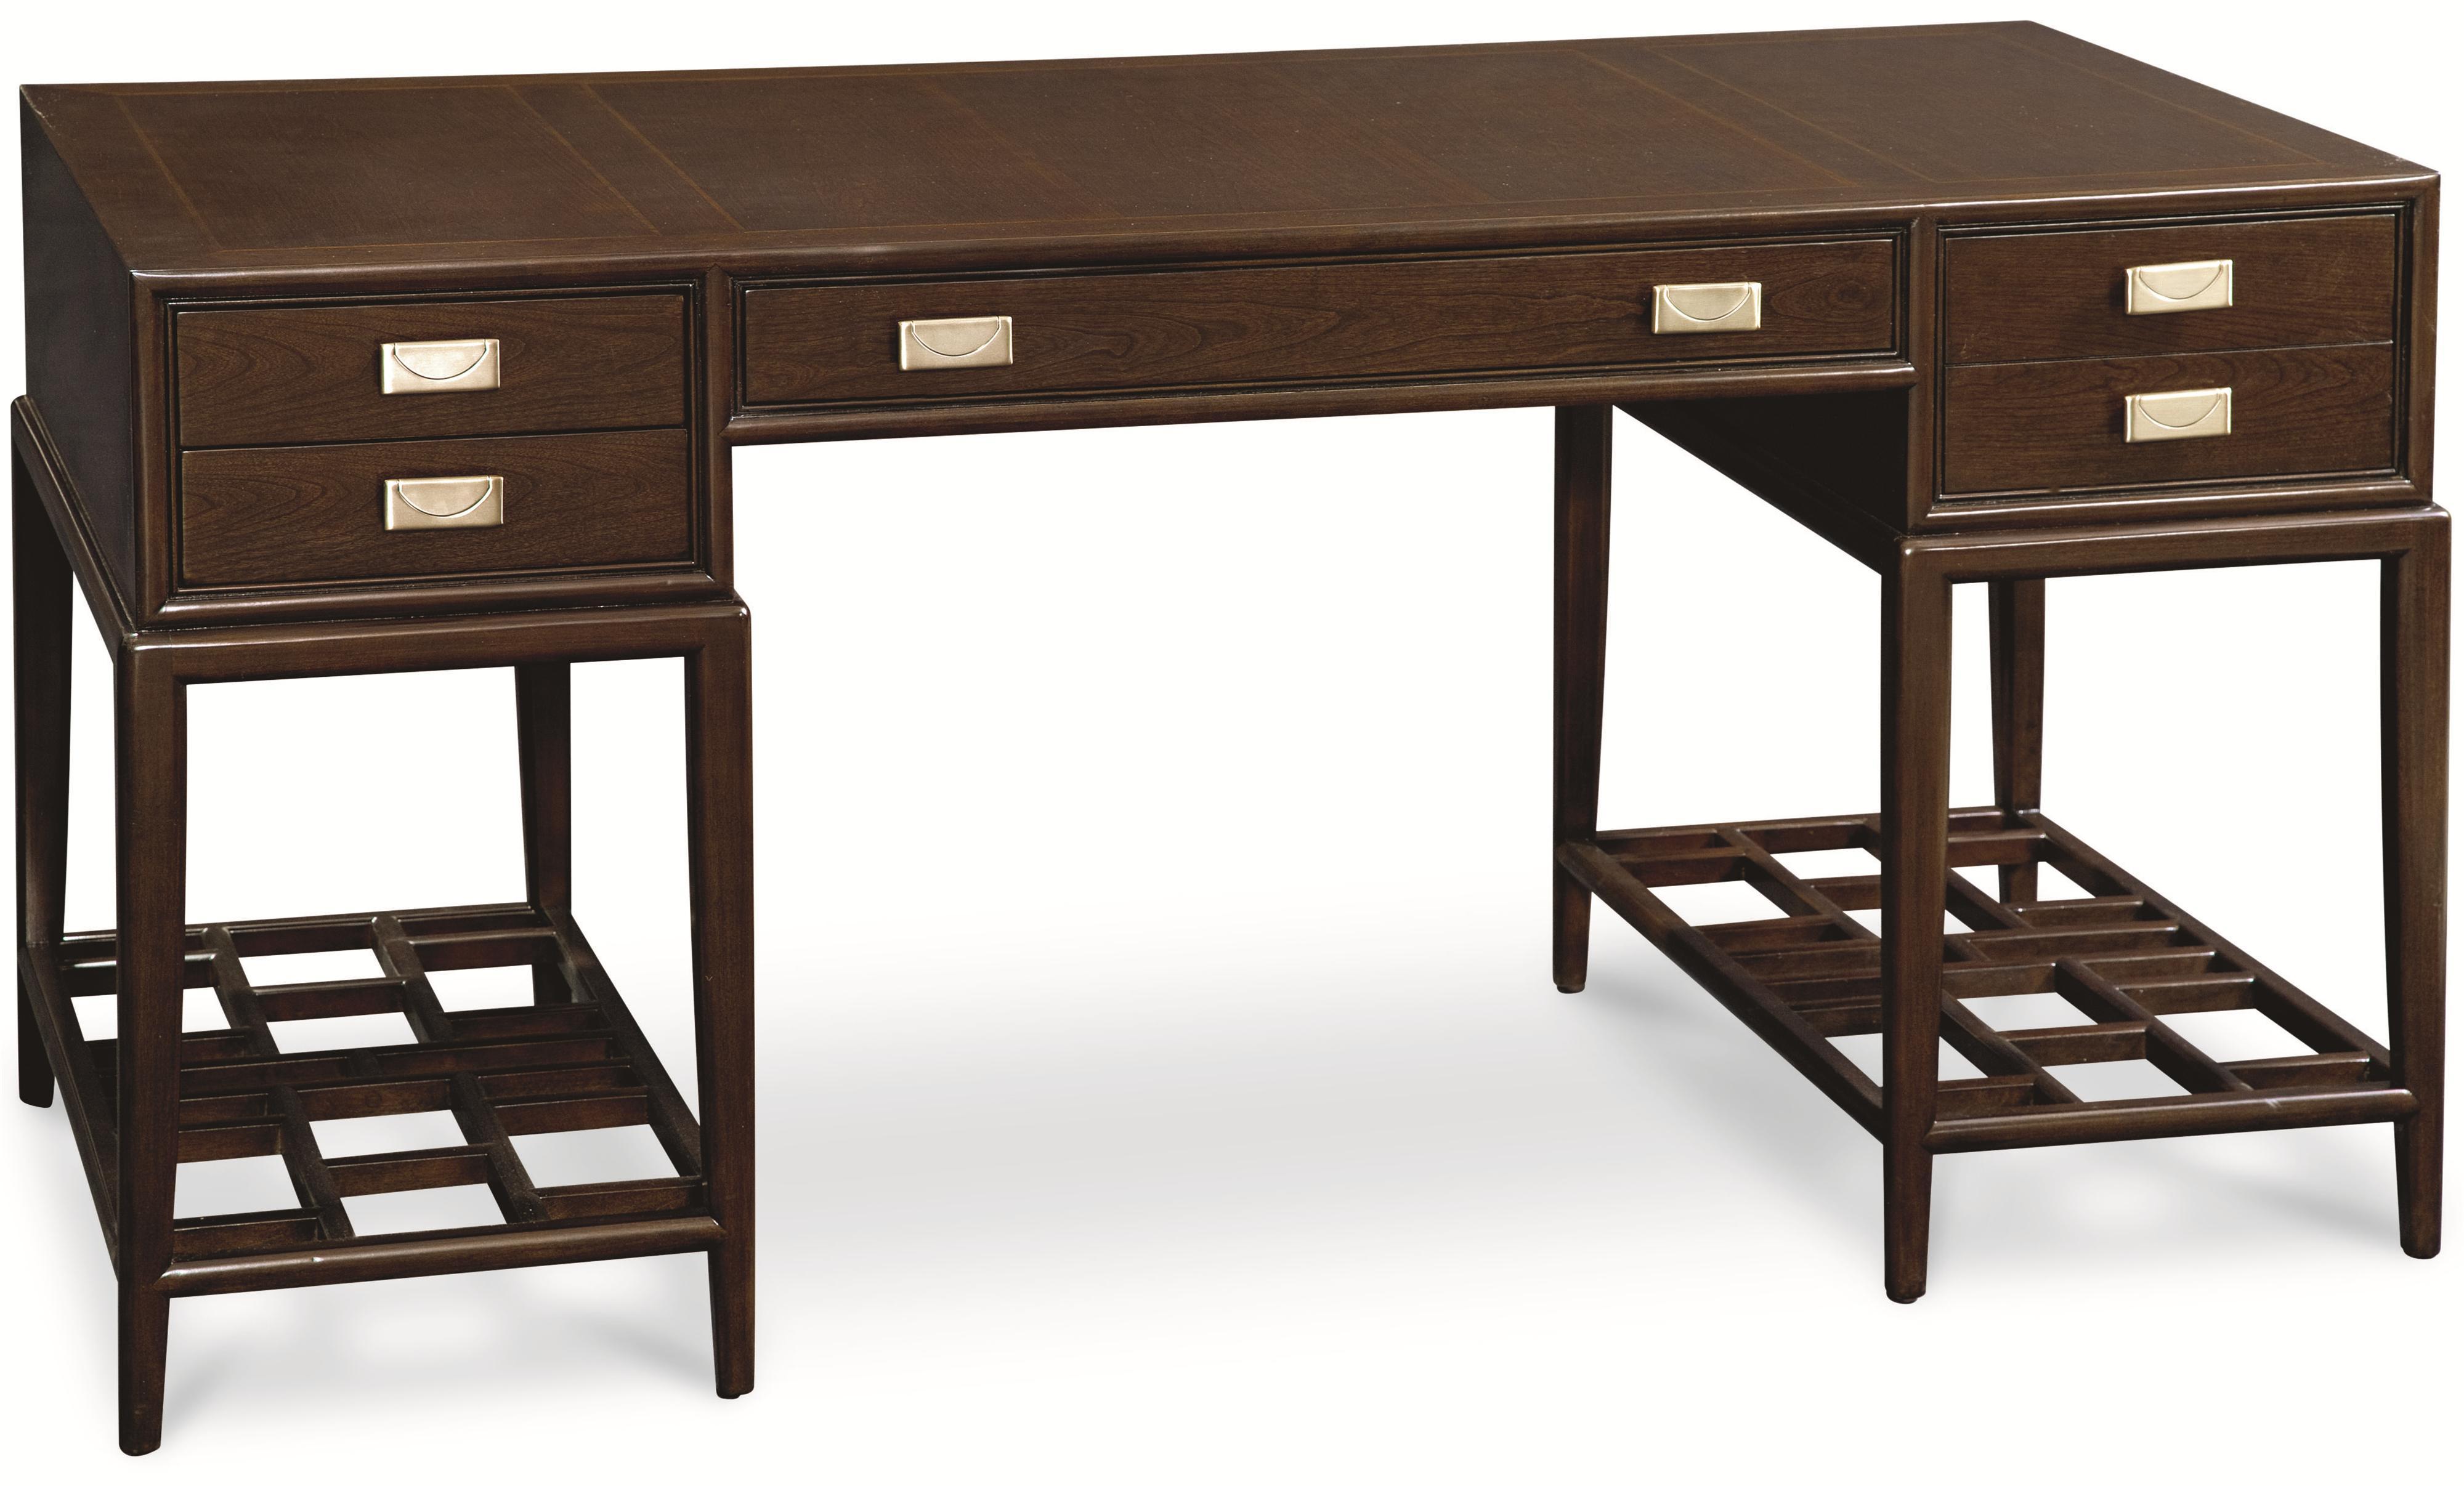 Thomasville® Lantau Writing Desk - Item Number: 82631-660